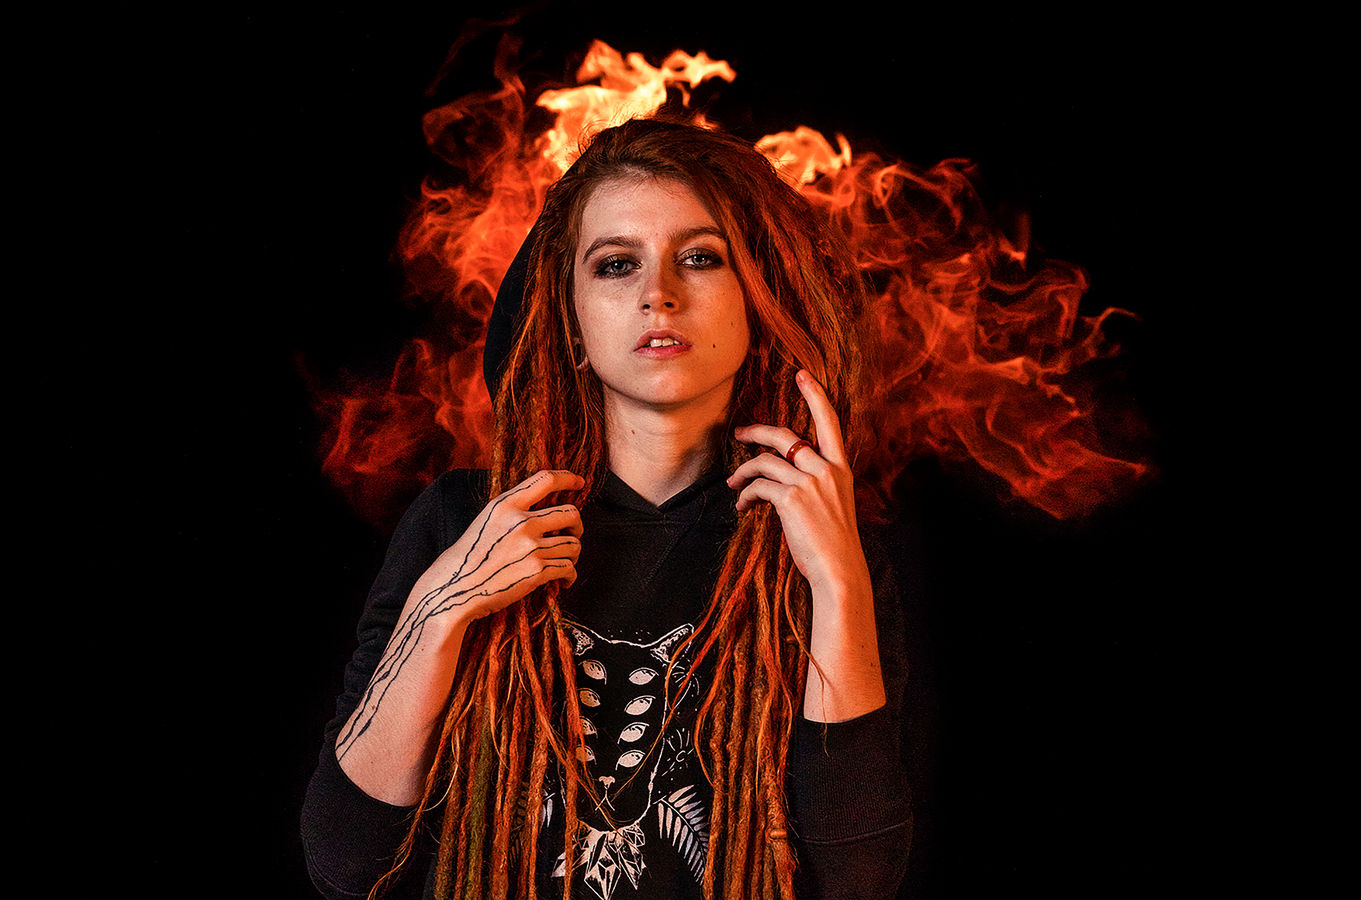 Princezna ohně